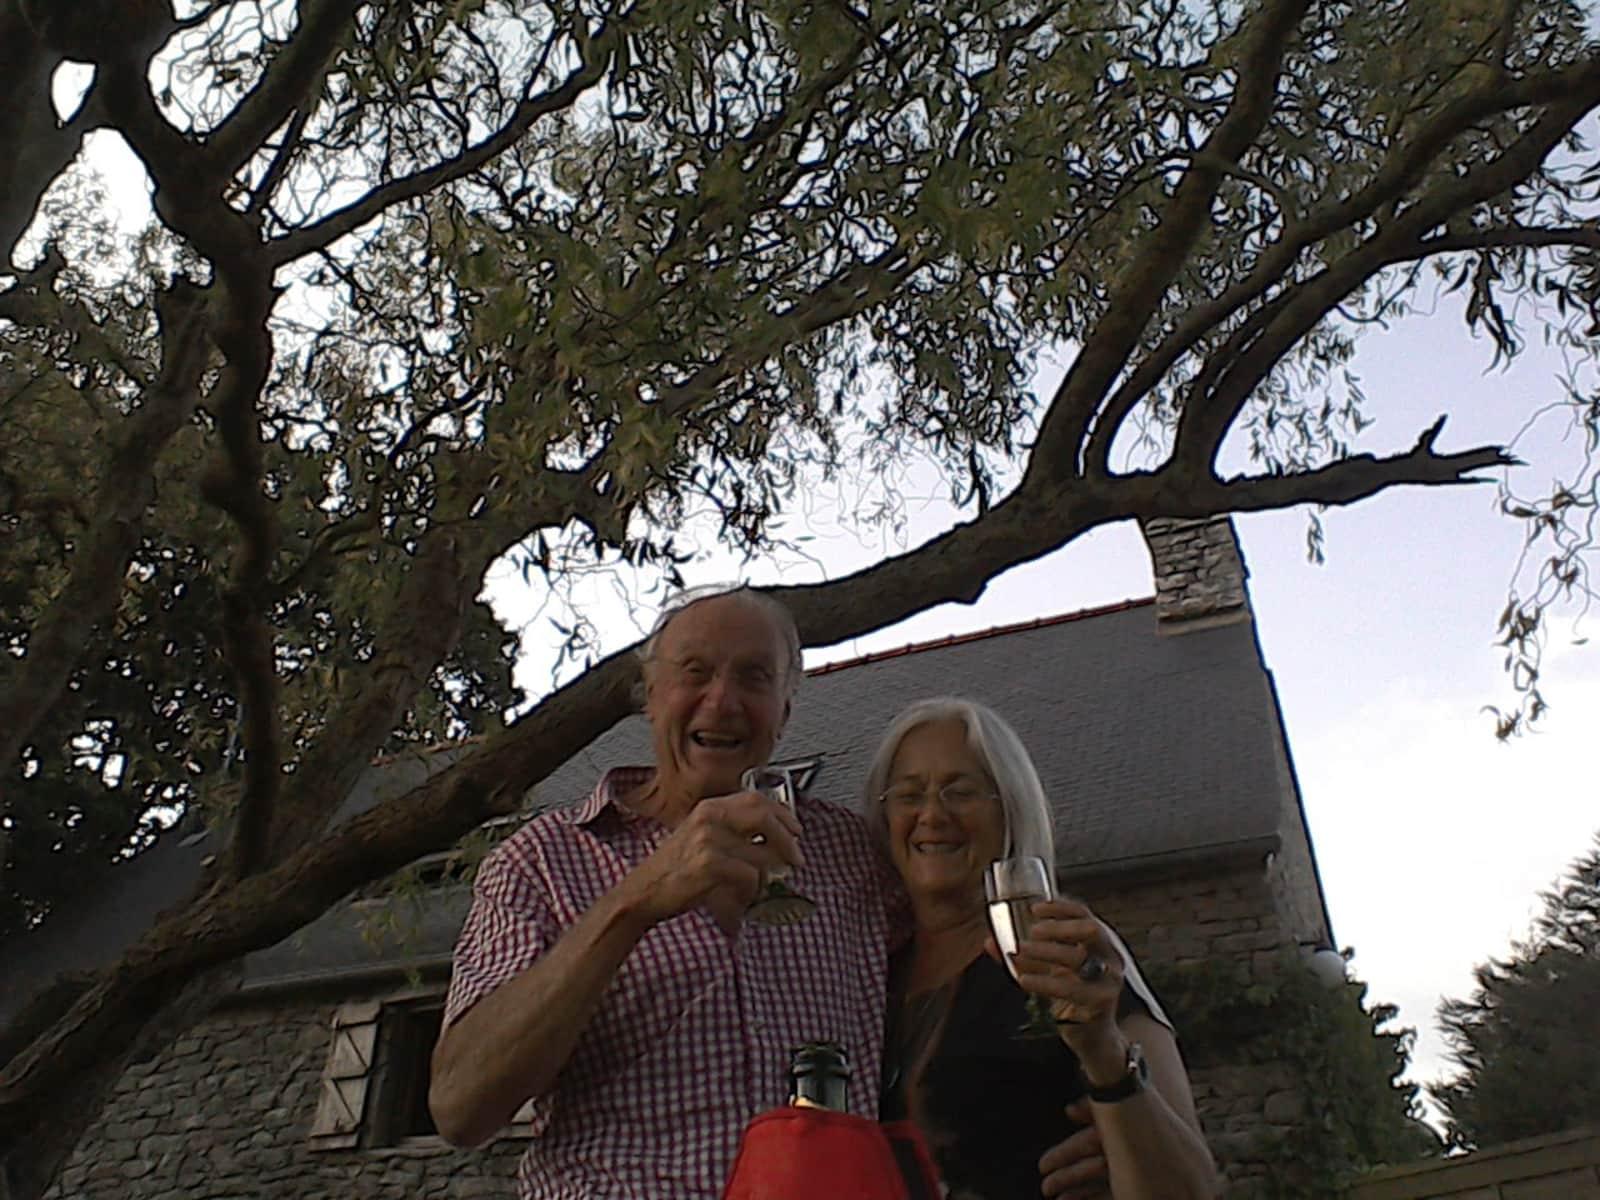 Diana & Matthew from Guégon, France